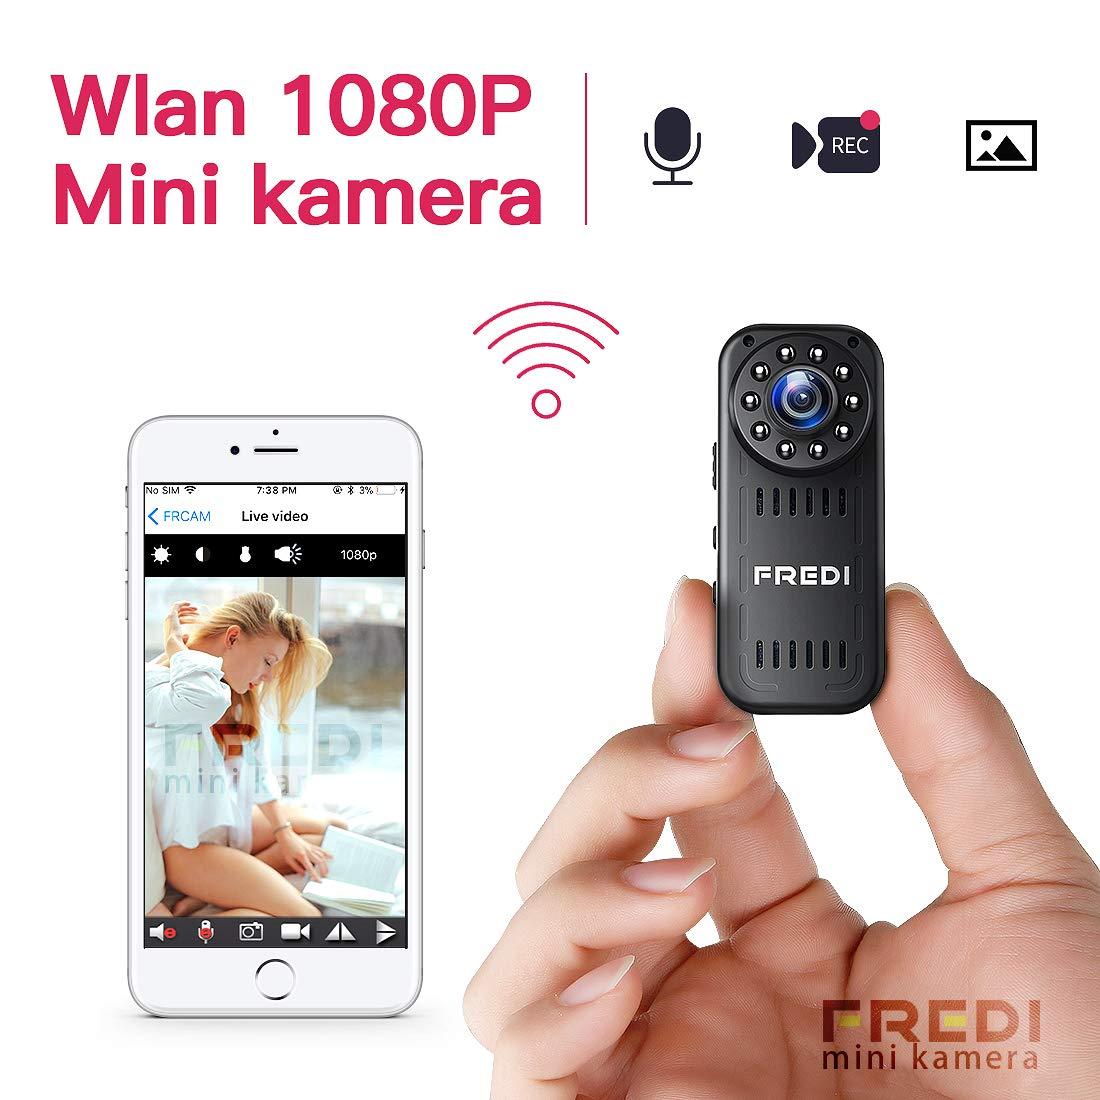 Mini Ü berwachungskamera, FREDI HD 1080P Mini Kamera WiFi Cam Kleine Bluetooth kabellos Tragbare IP Kamera Ü berwachung P2P mit Bewegungsmelder/IR Nachtsicht mit Akku Innen Auß en fü r iPhone app